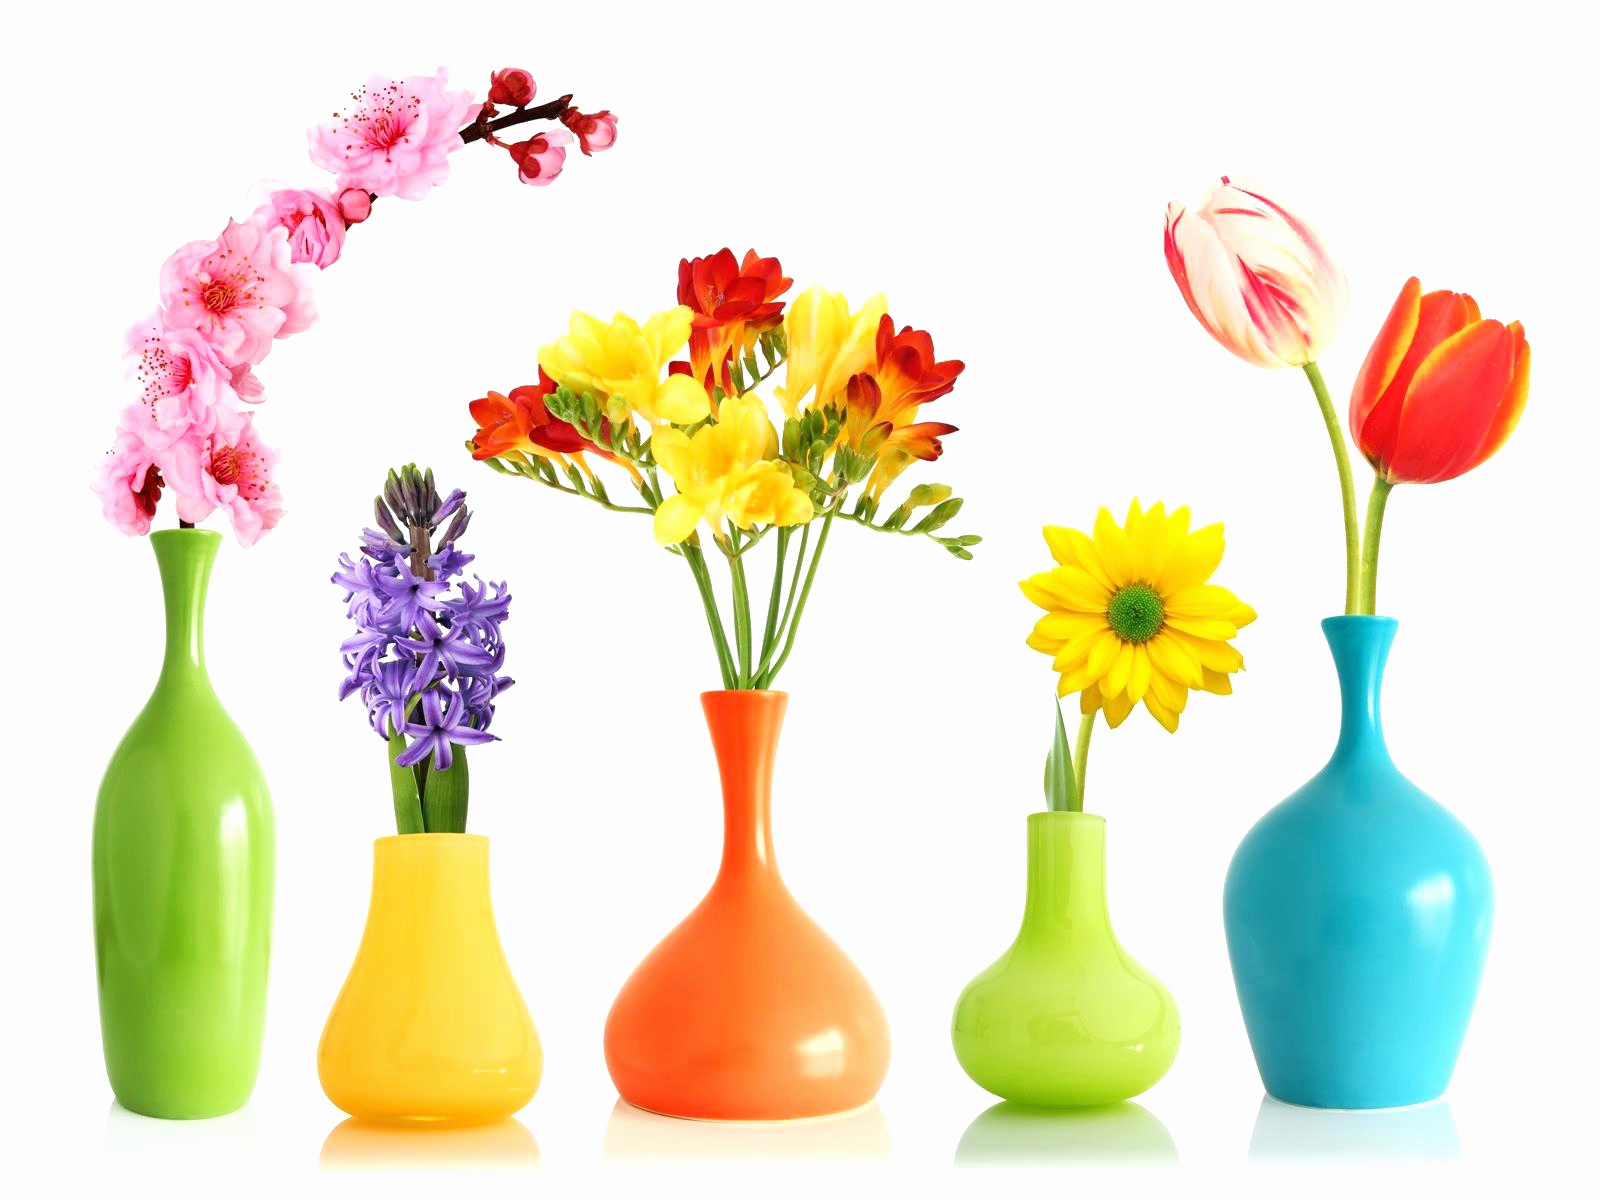 1600x1200 Flower Vase Drawing Lovely Flower Vase With Flowers Line India